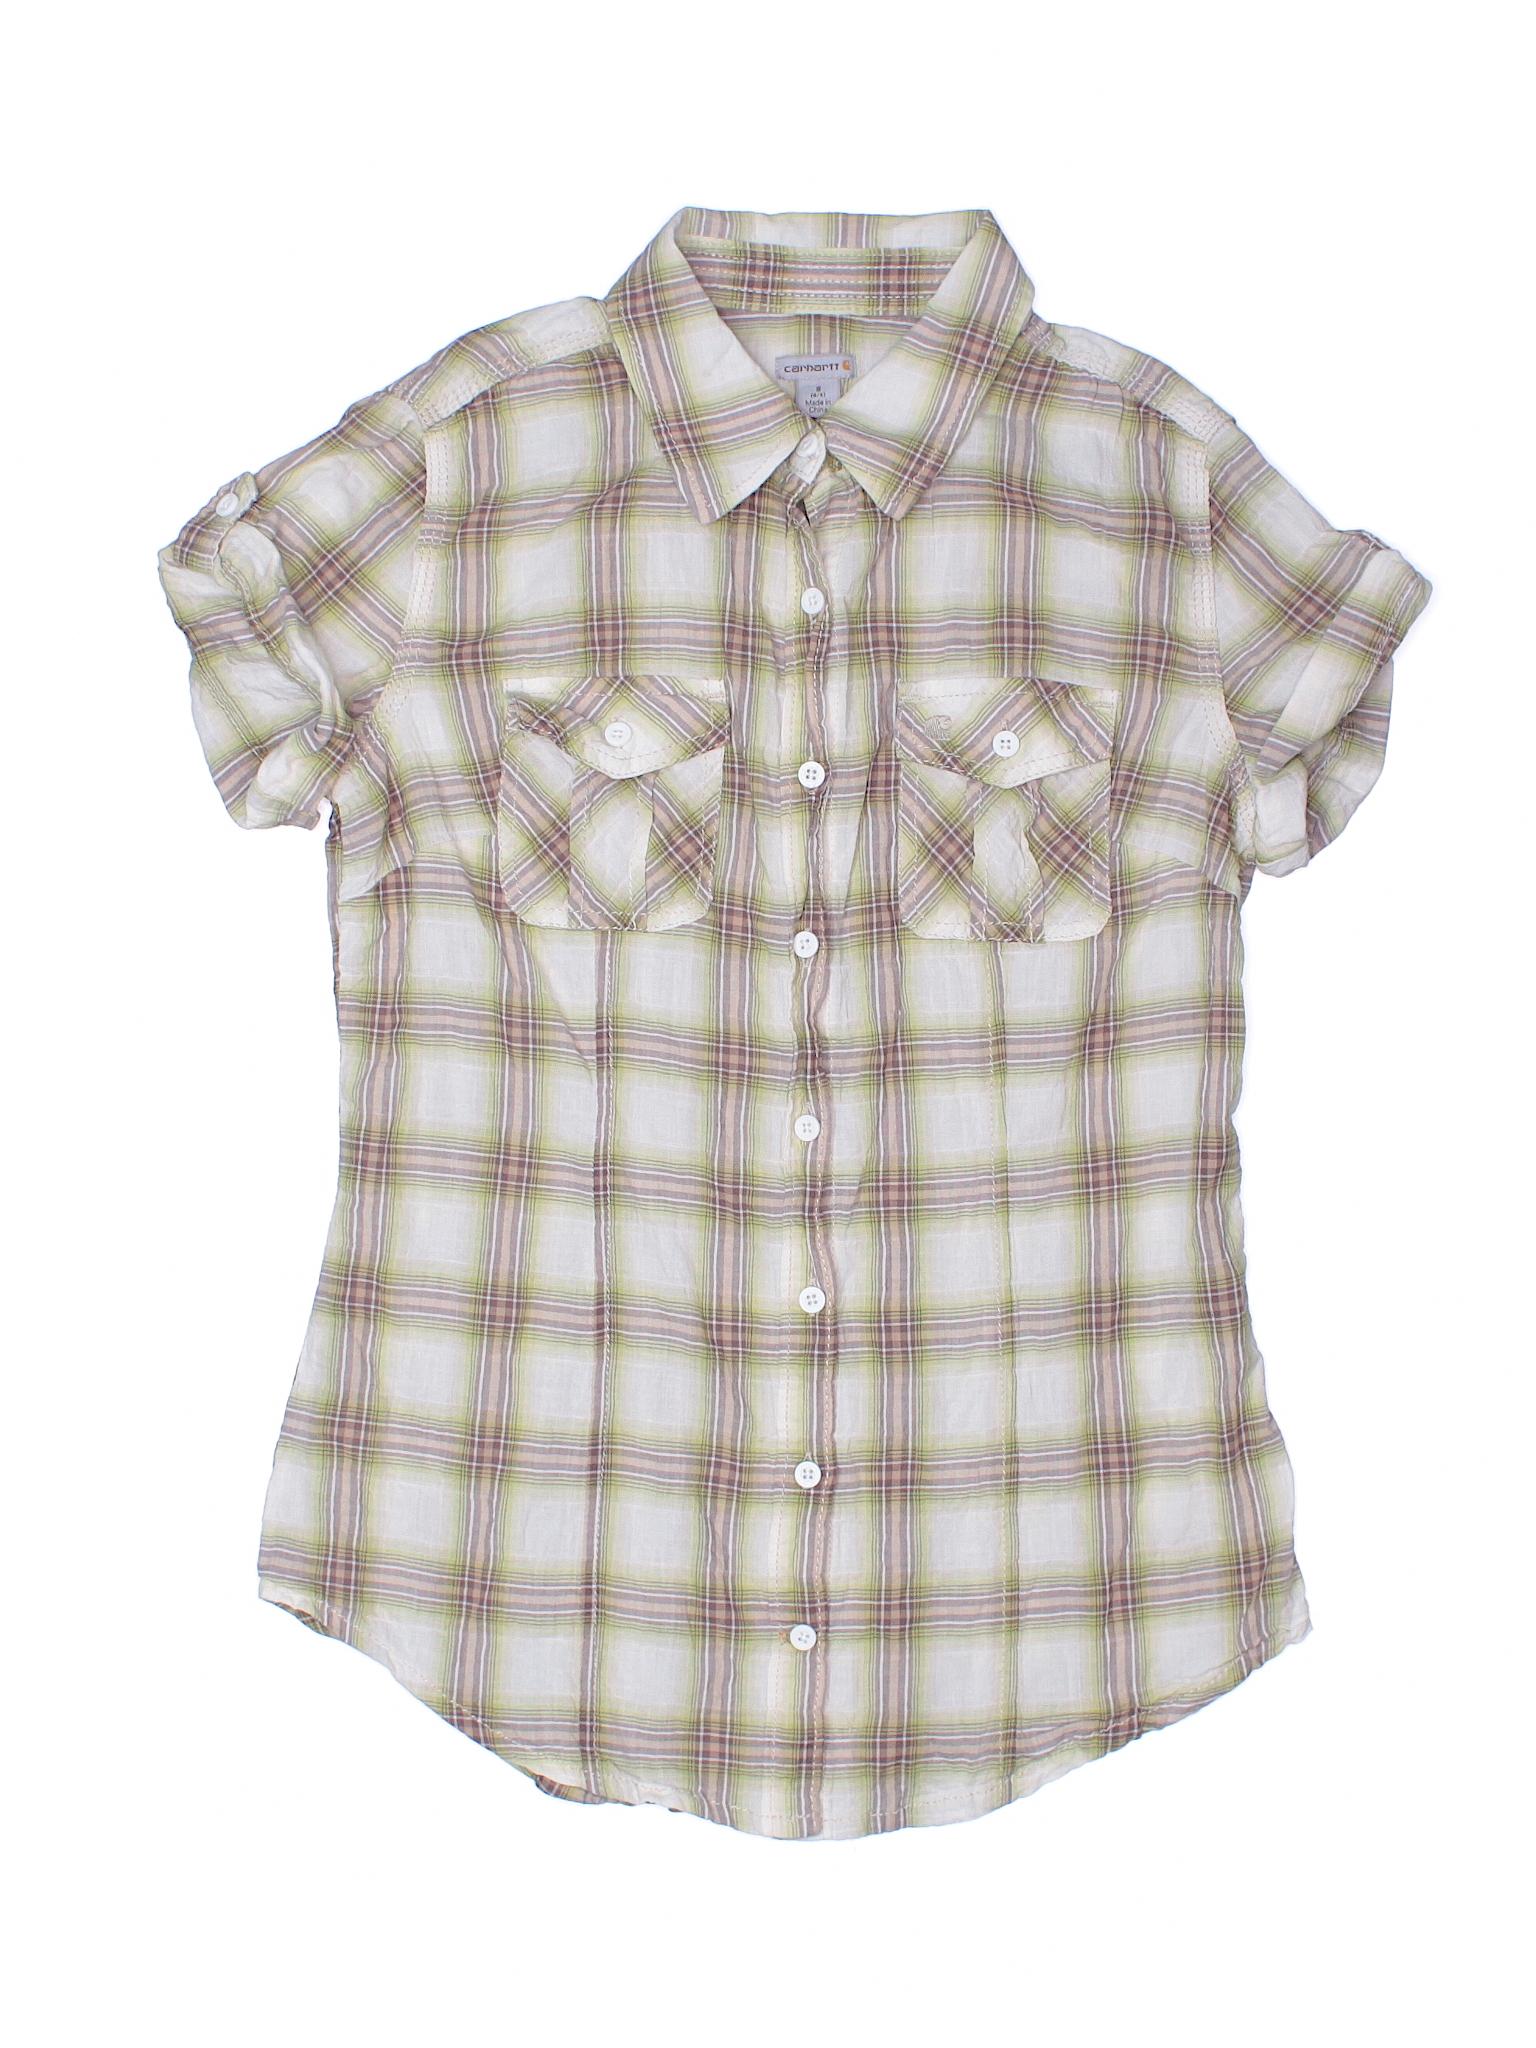 Carhartt Short Sleeve Button Down Shirt 65 Off Only On